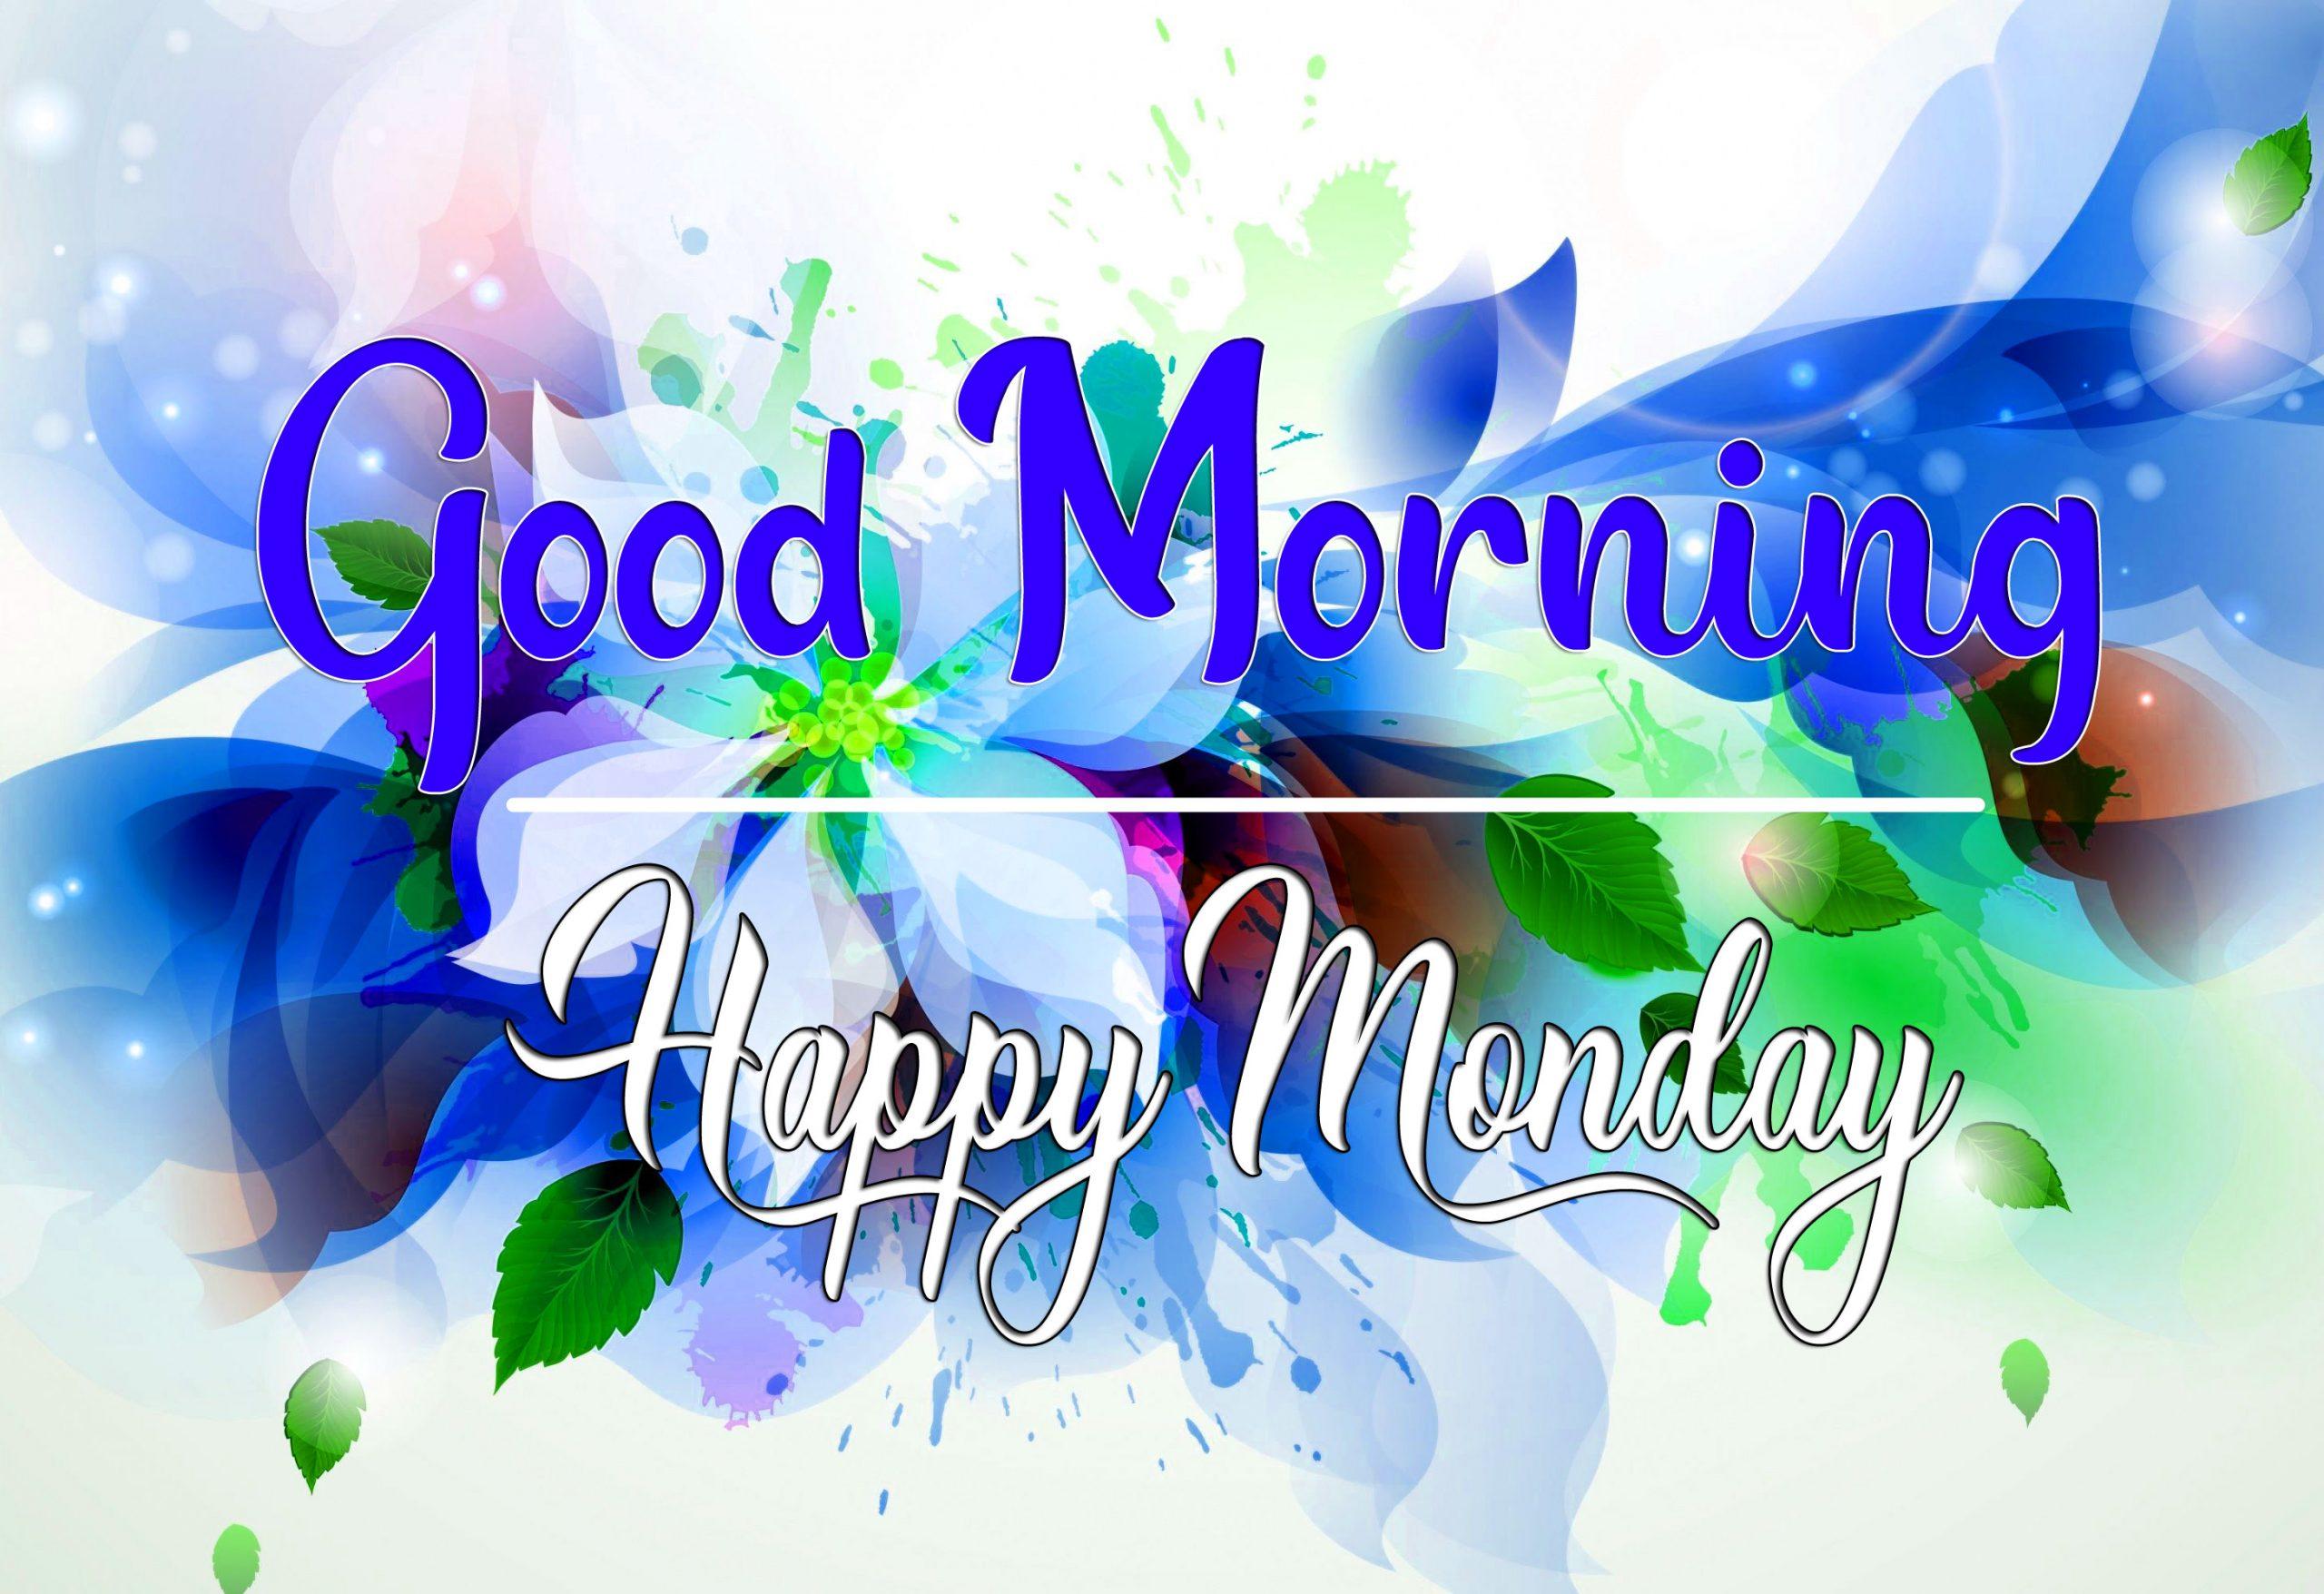 Monday Good Morning Pics HD 1